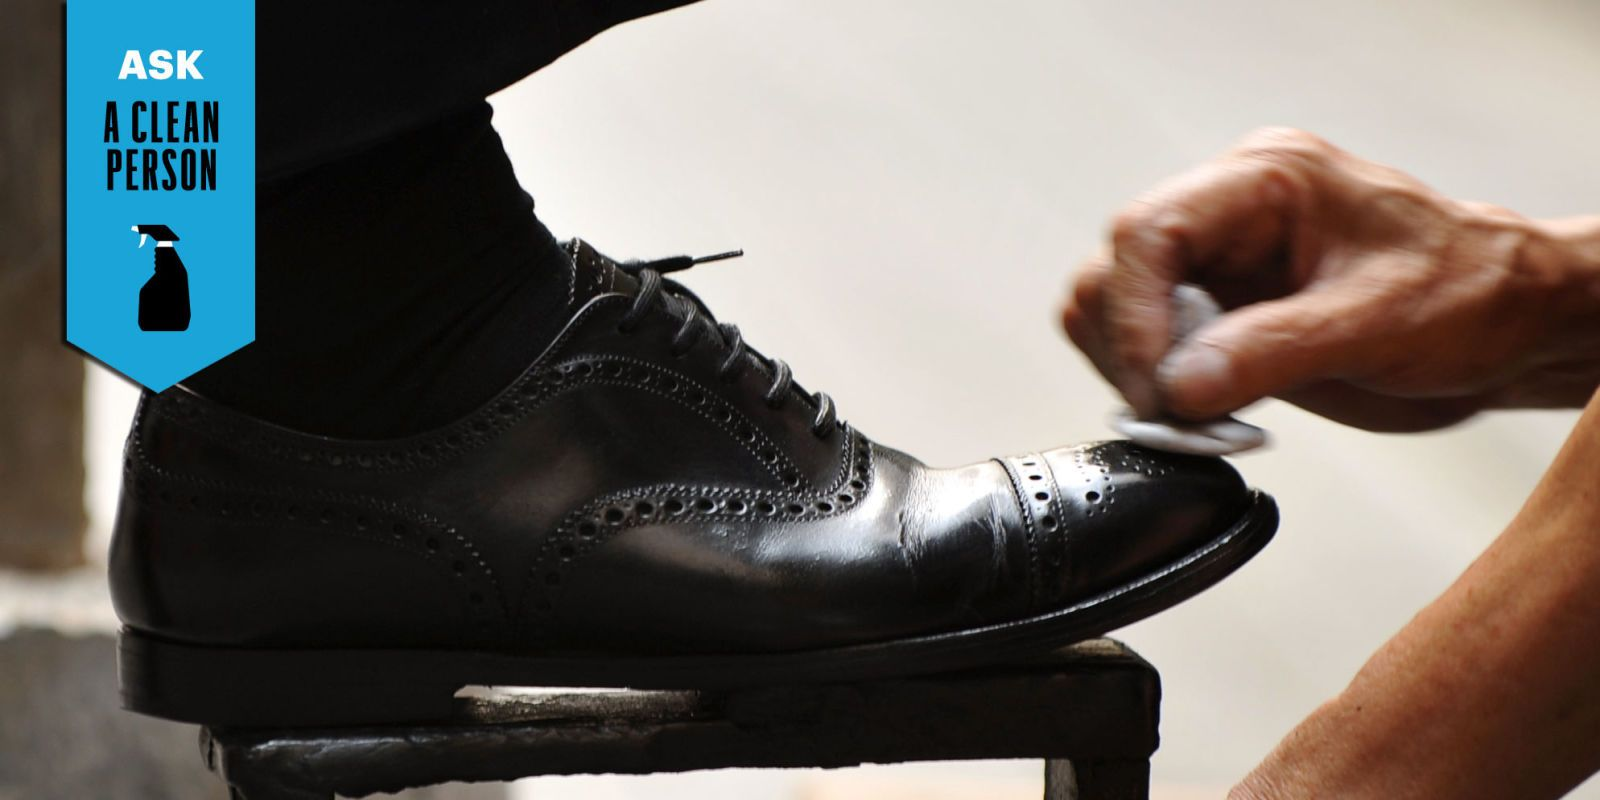 TOWER Shoe Shine Cloth dKxyPbWU